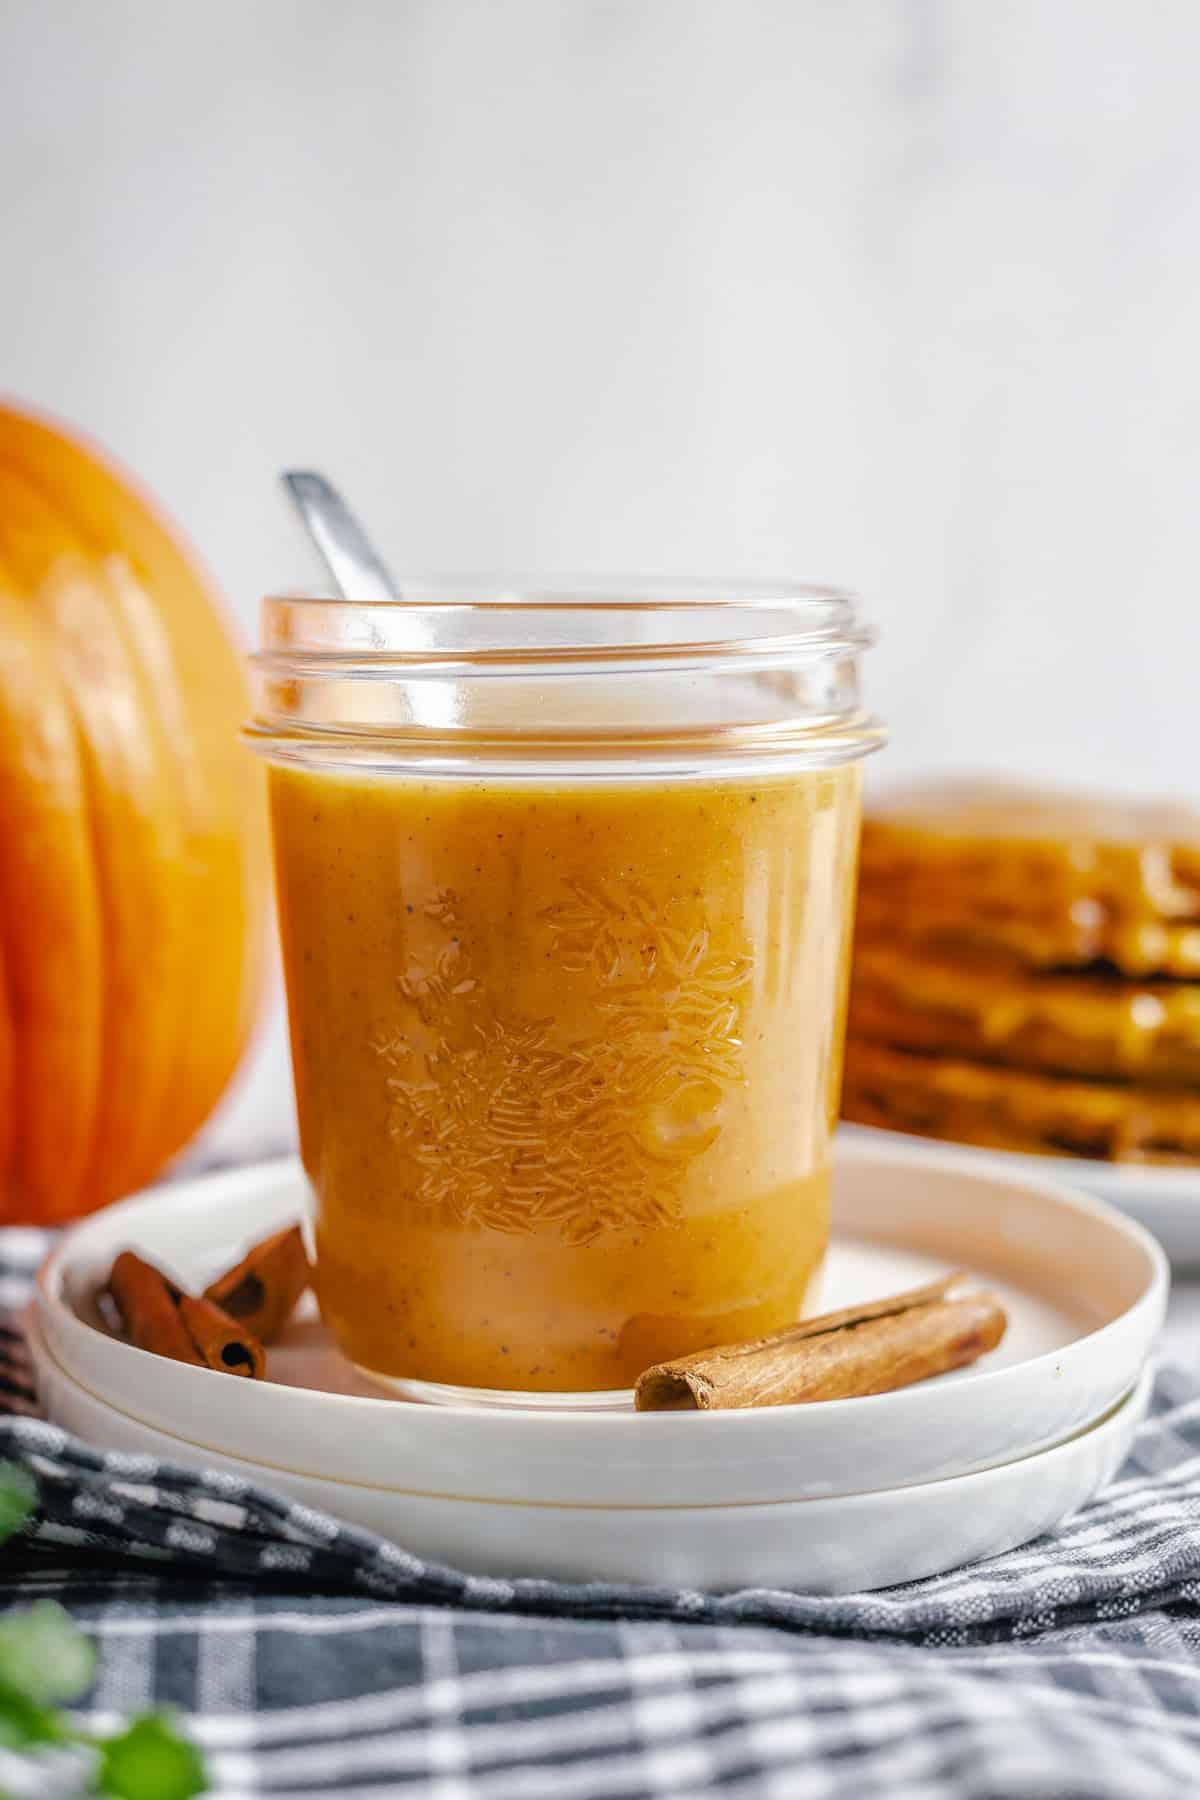 pumpkin caramel sauce in a jar with a pumpkin and pancakes background